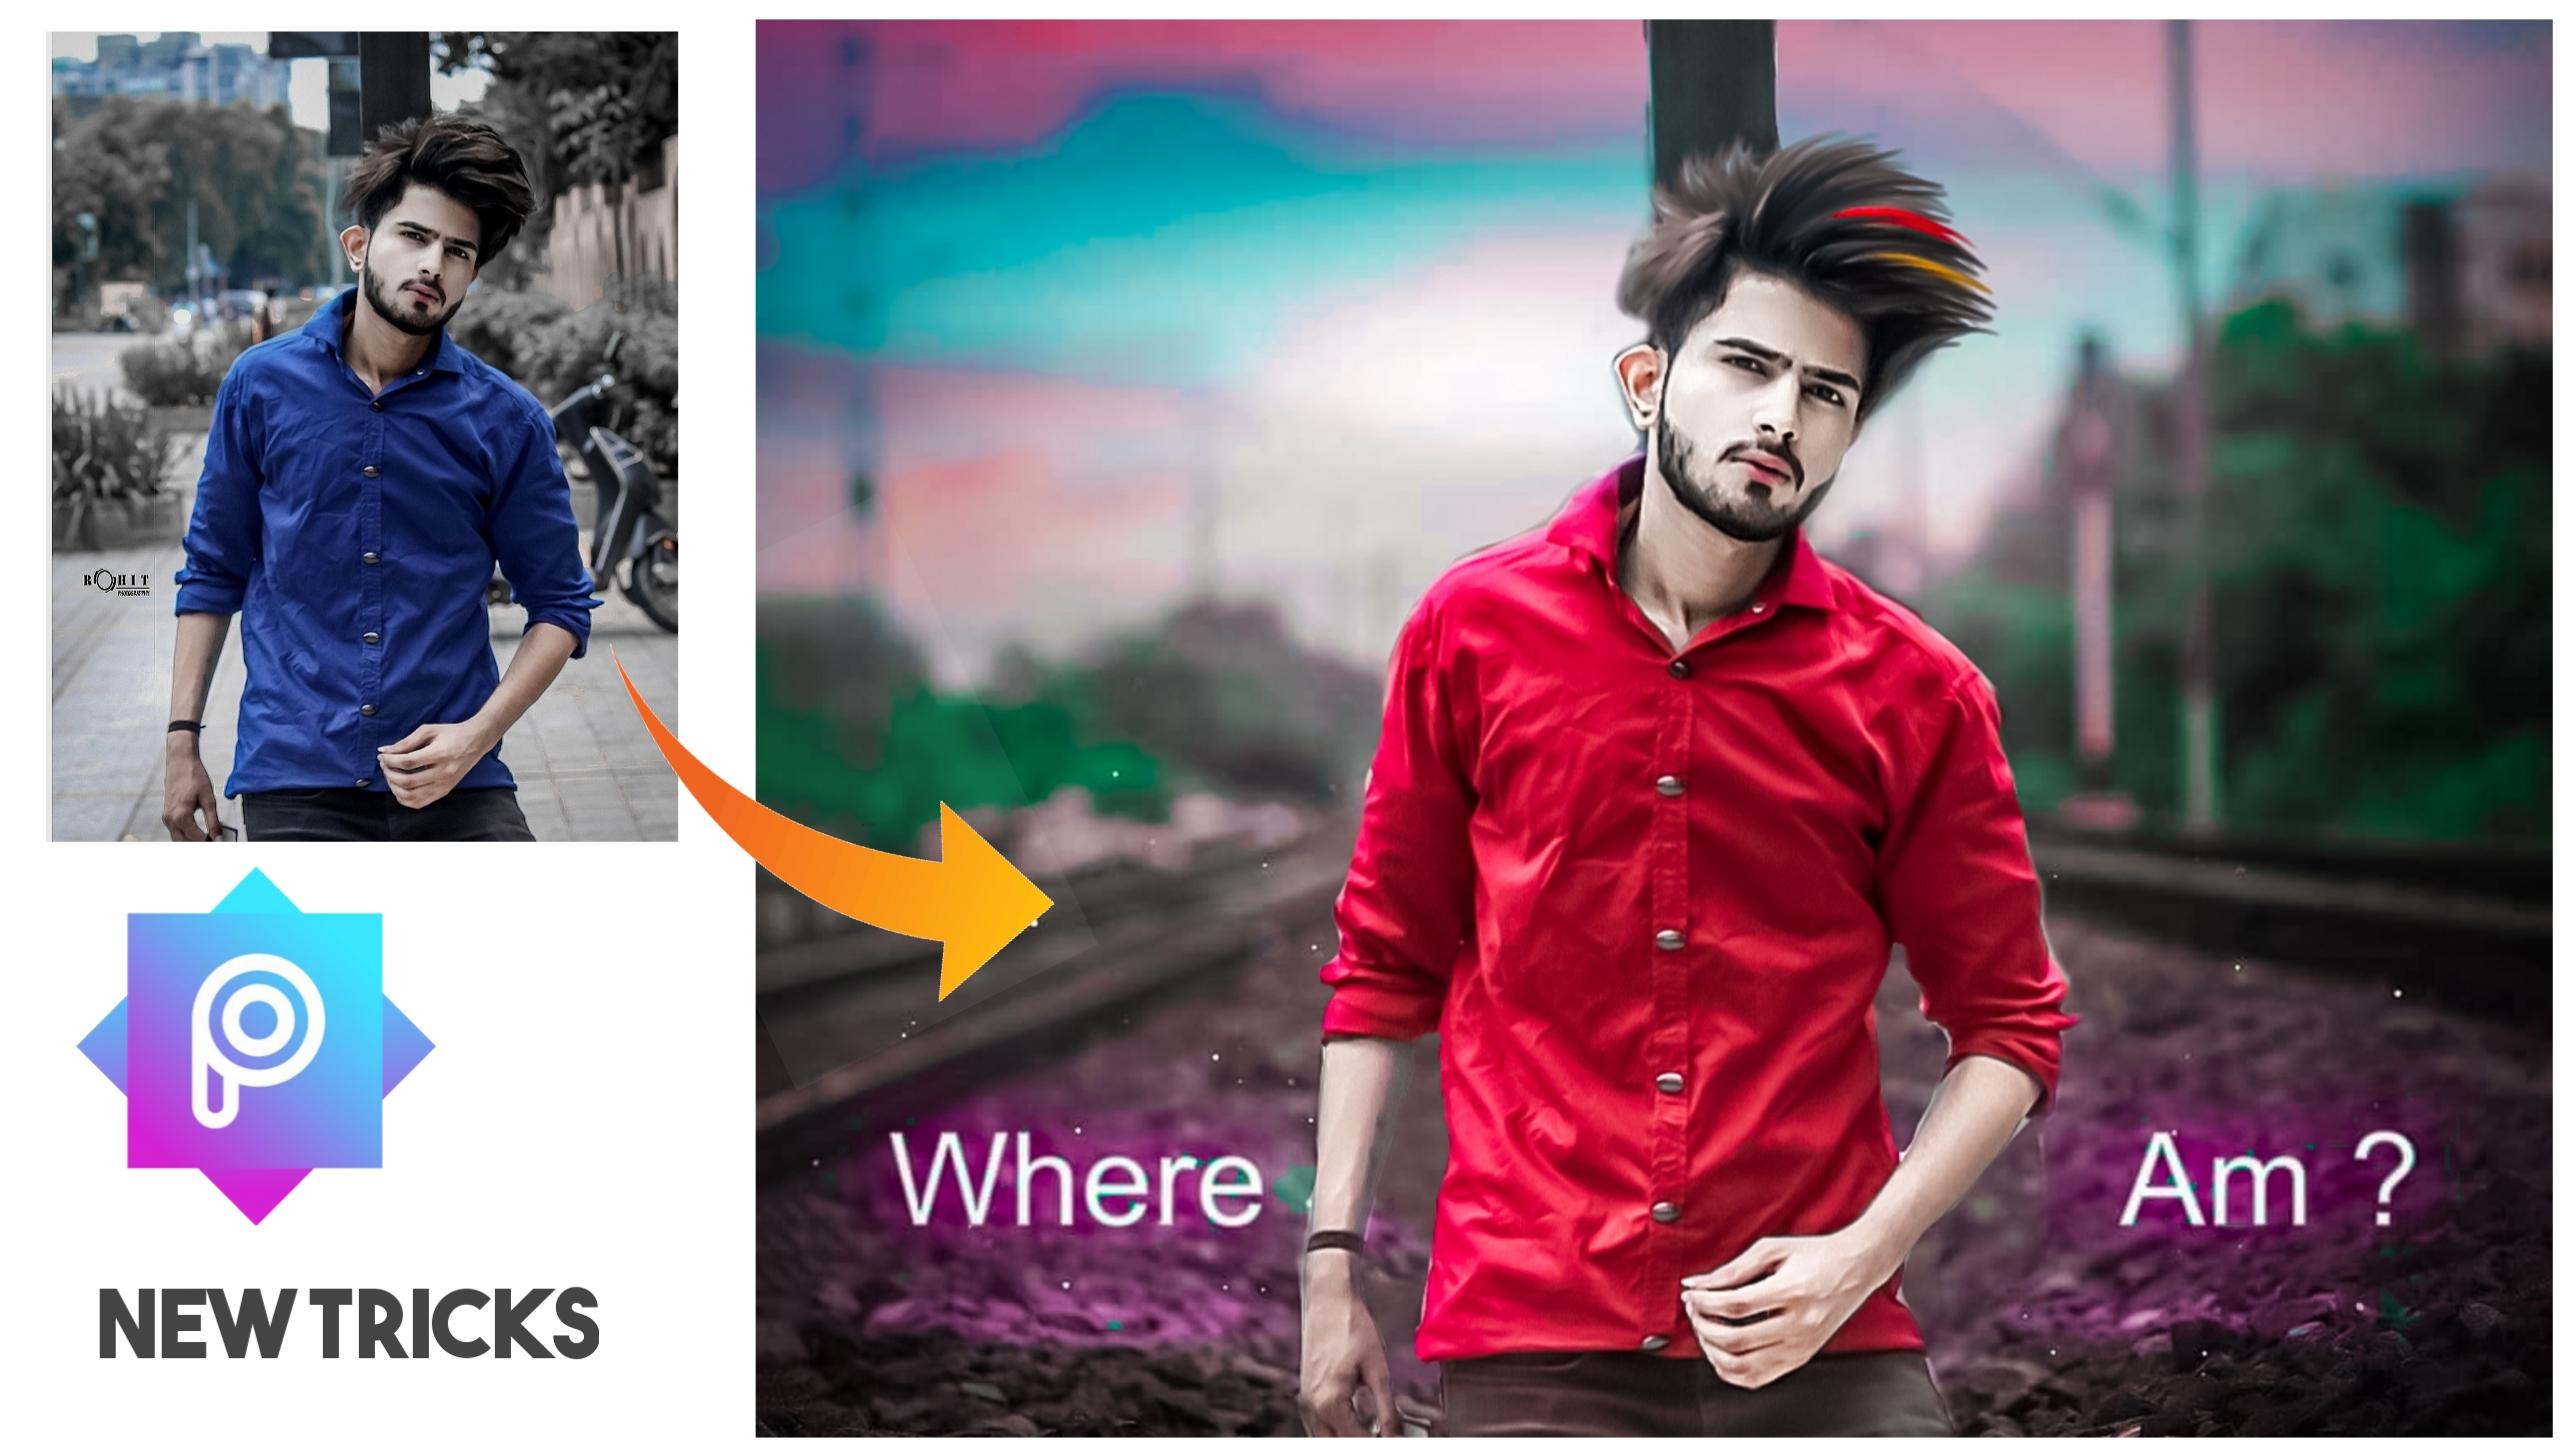 Picsart Background Change